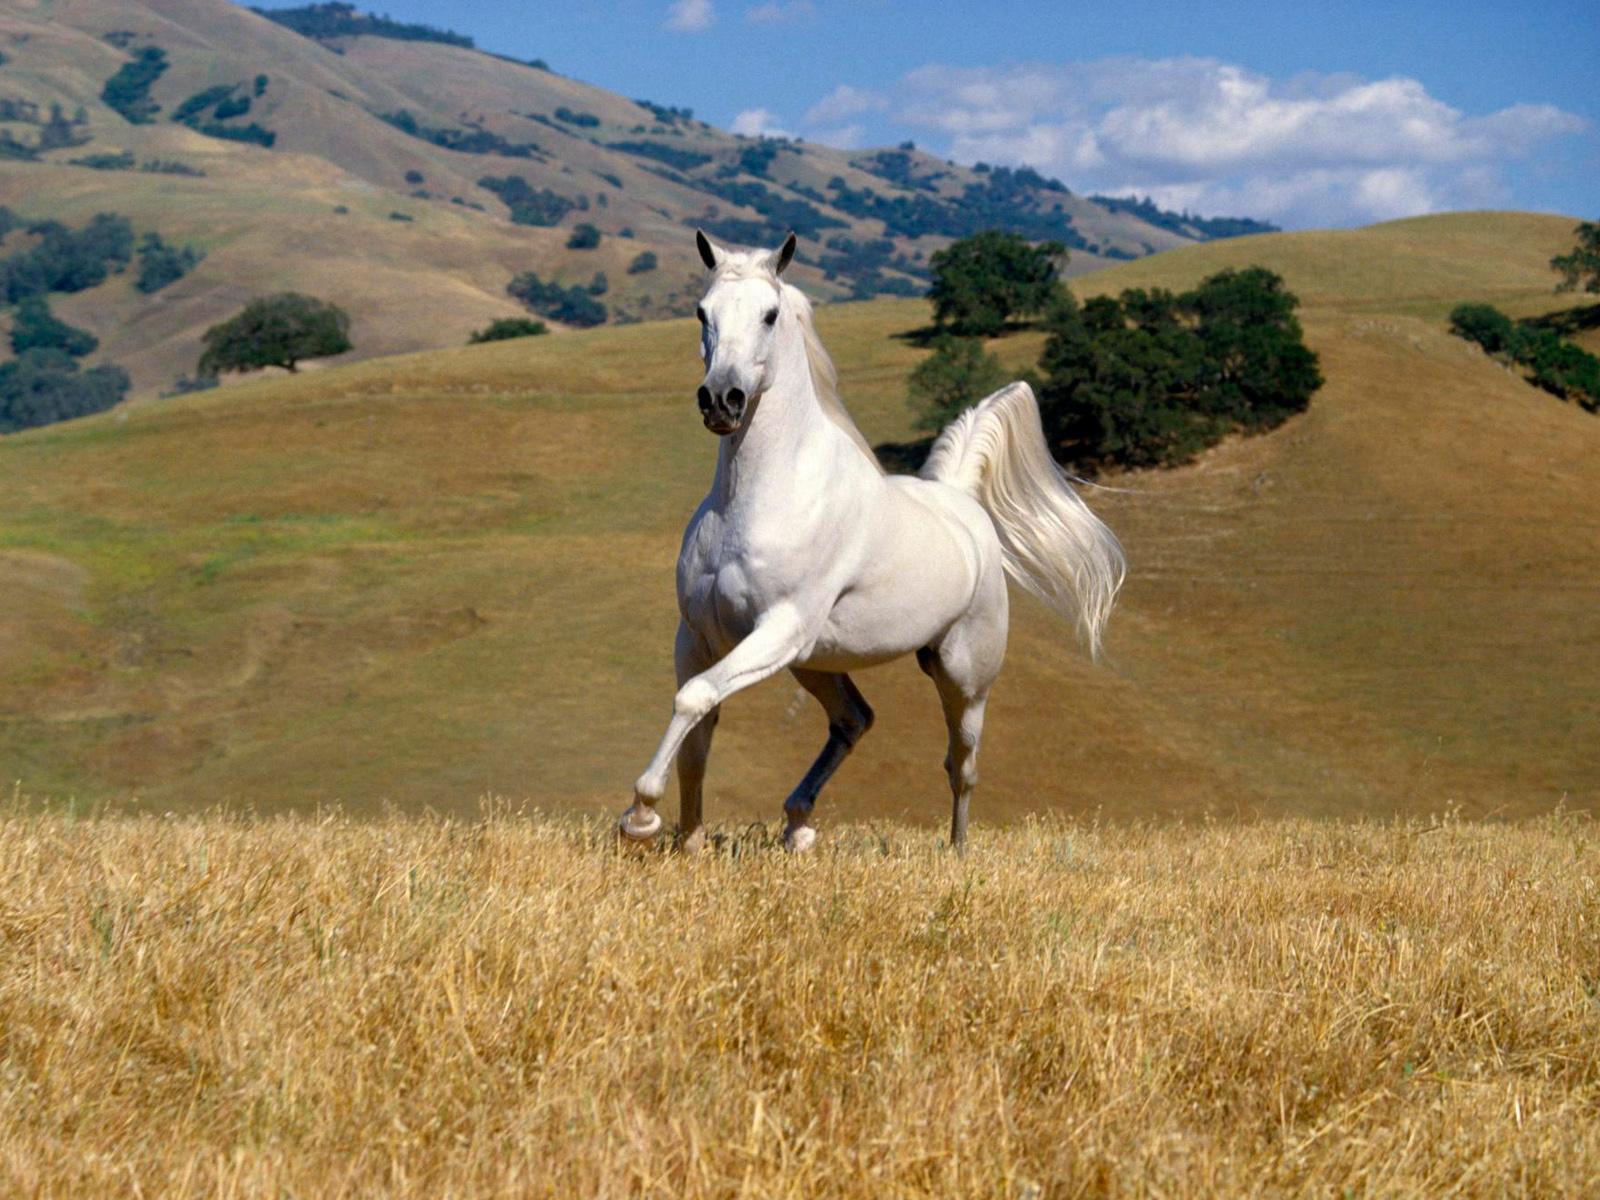 http://4.bp.blogspot.com/-QlYK5jHWX7c/T5UMjxHEs3I/AAAAAAAAABA/MyEmGSHts_4/s1600/Beautiful_White_Horse.jpg